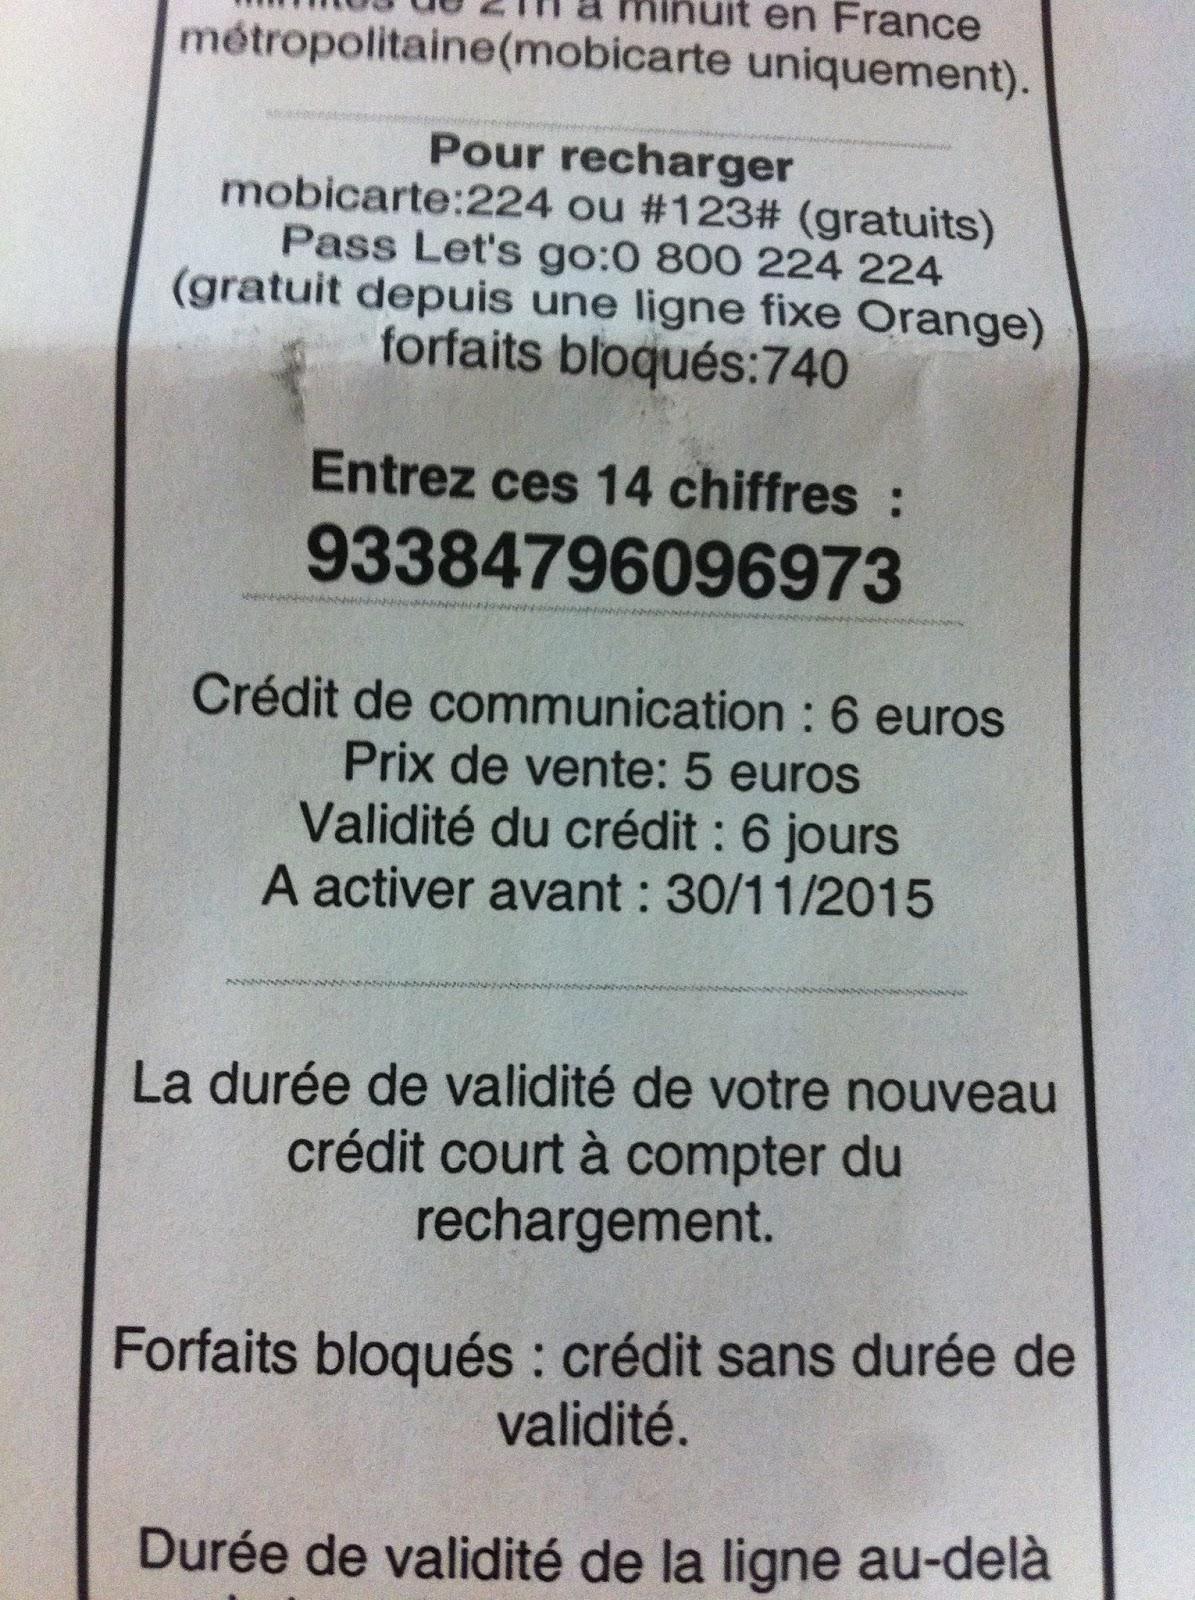 Online recharge discount coupons